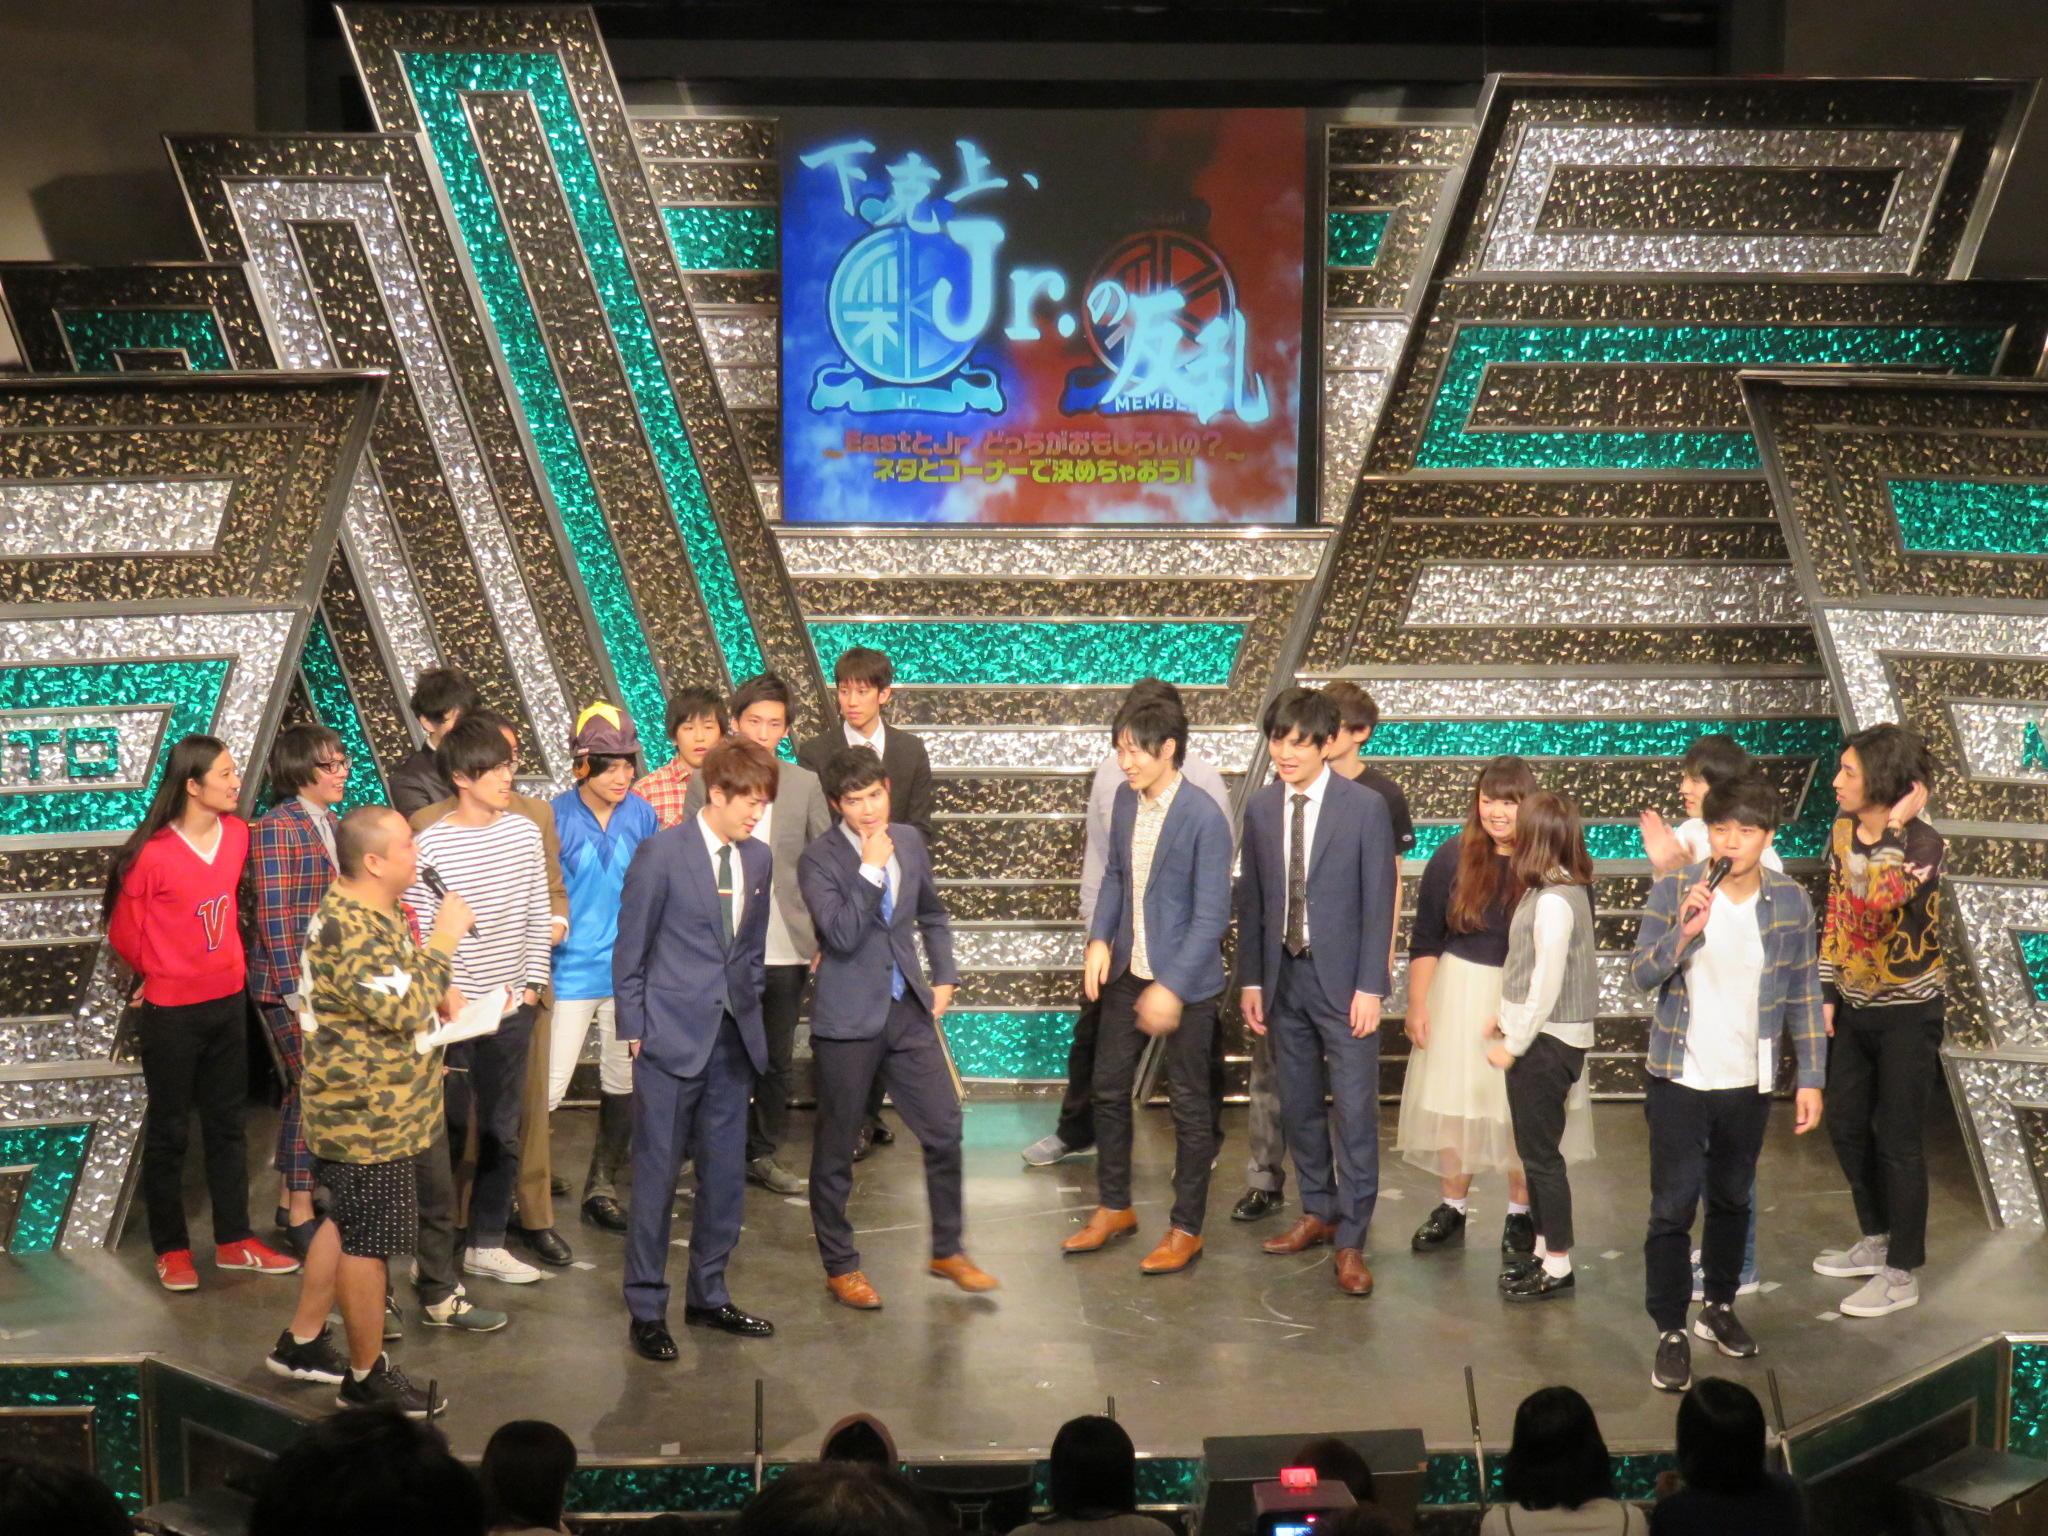 http://news.yoshimoto.co.jp/20160229162339-abdd8440b97990feae639673d380ba336b494b18.jpg